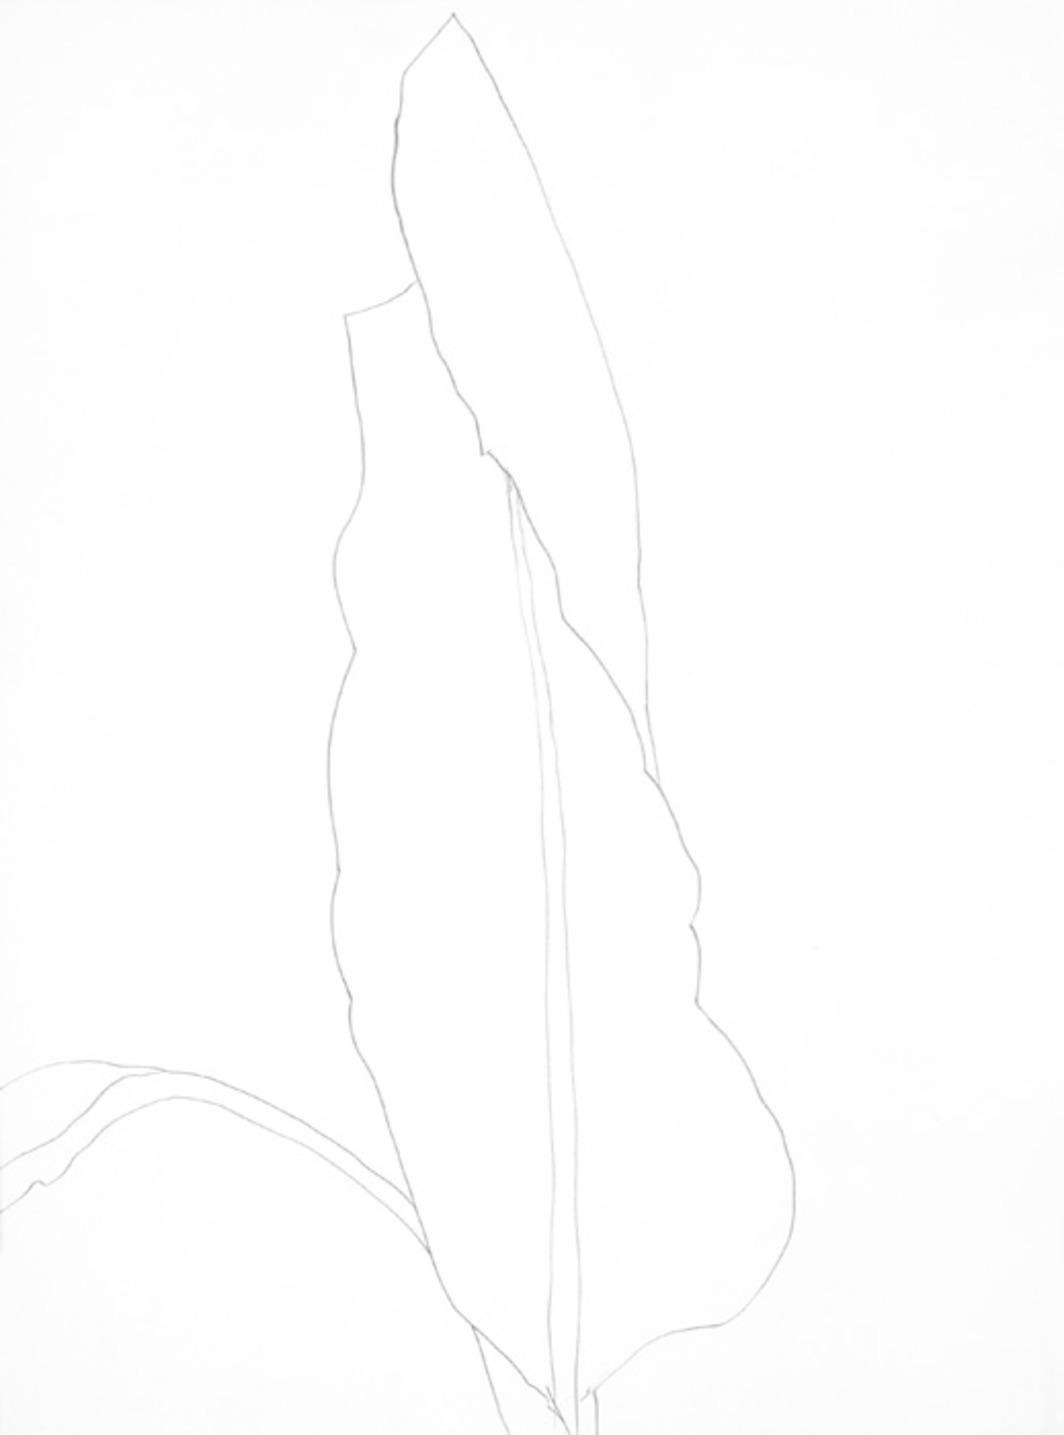 Ellsworth Kelly Plant Drawings At The Metropolitan Museum